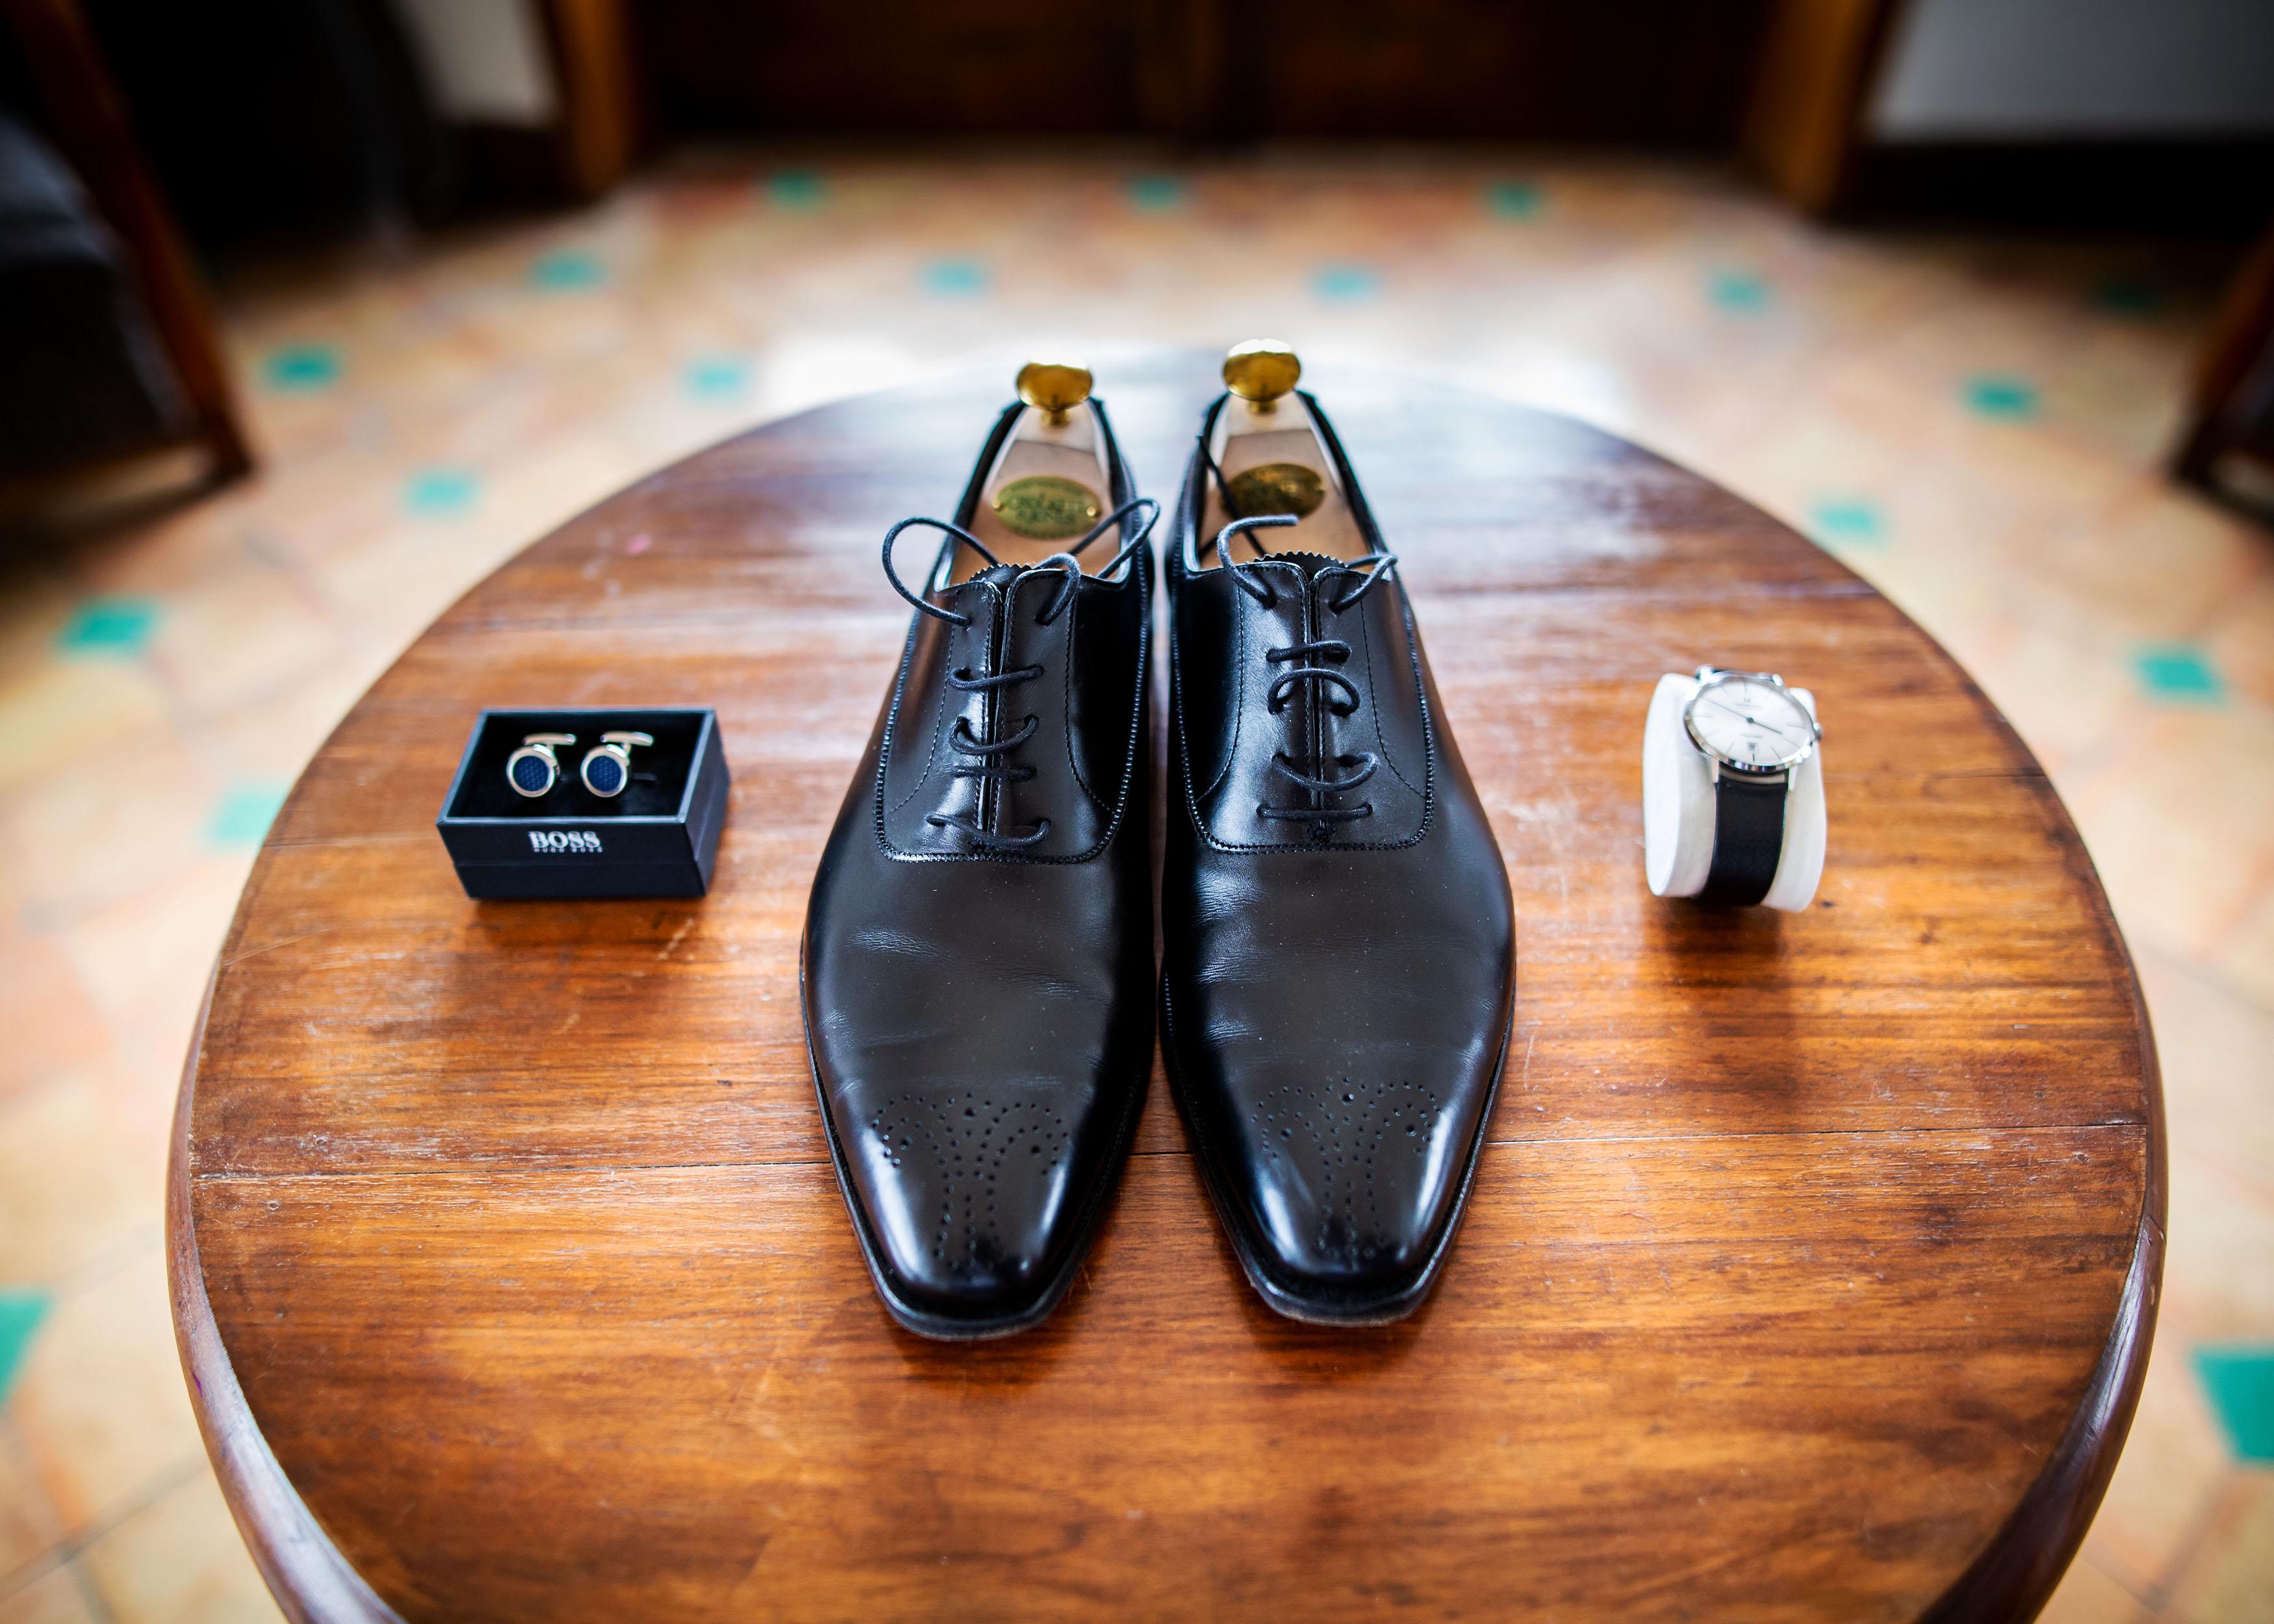 http://www.weddingamalfi.com/wp-content/uploads/Katia-Jorge-18-maggio-2019-1.jpg